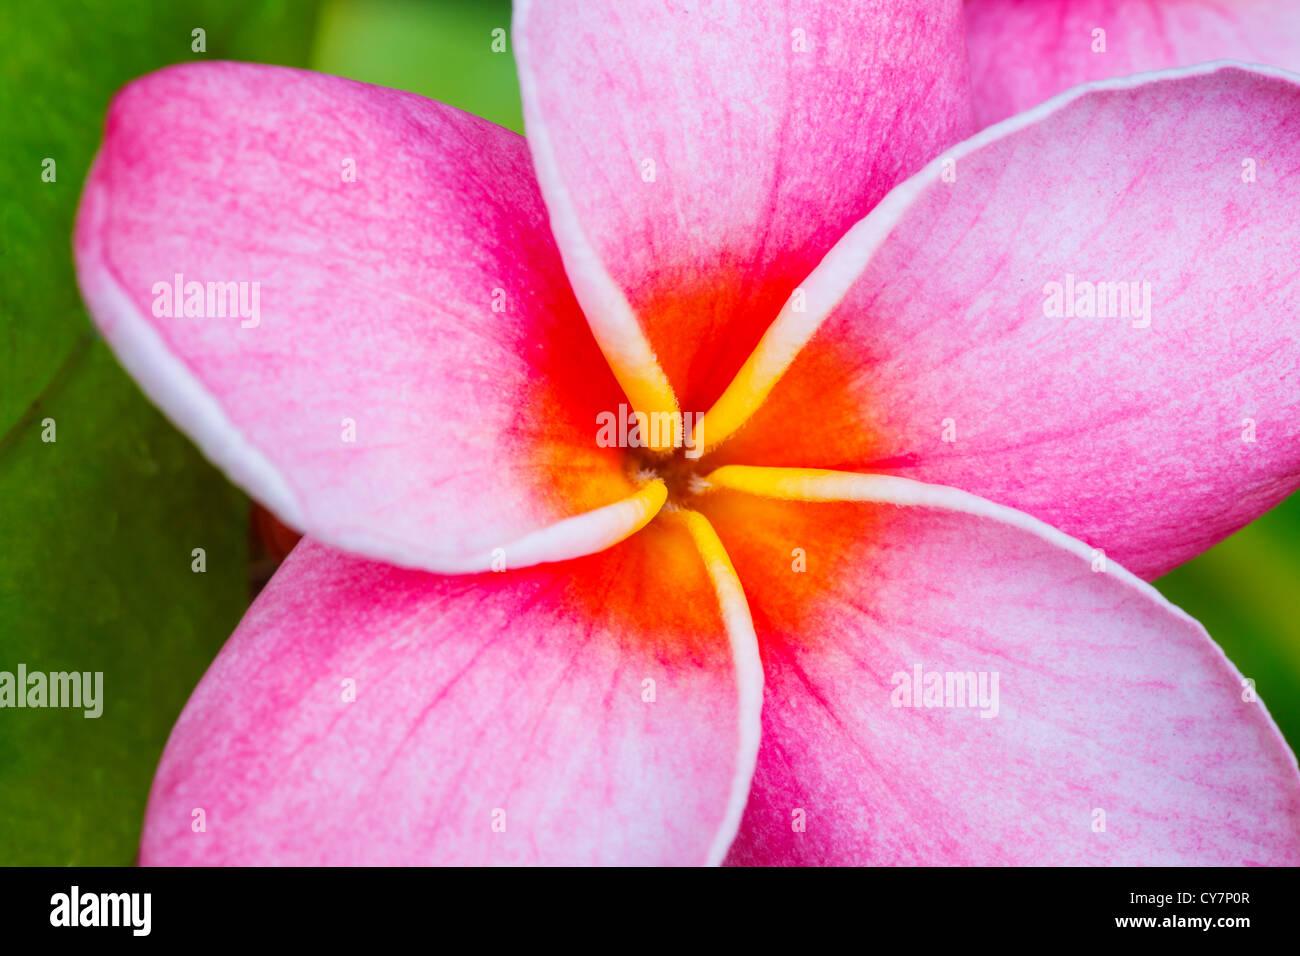 Pink plumeria flower stock photo 51187383 alamy pink plumeria flower mightylinksfo Choice Image